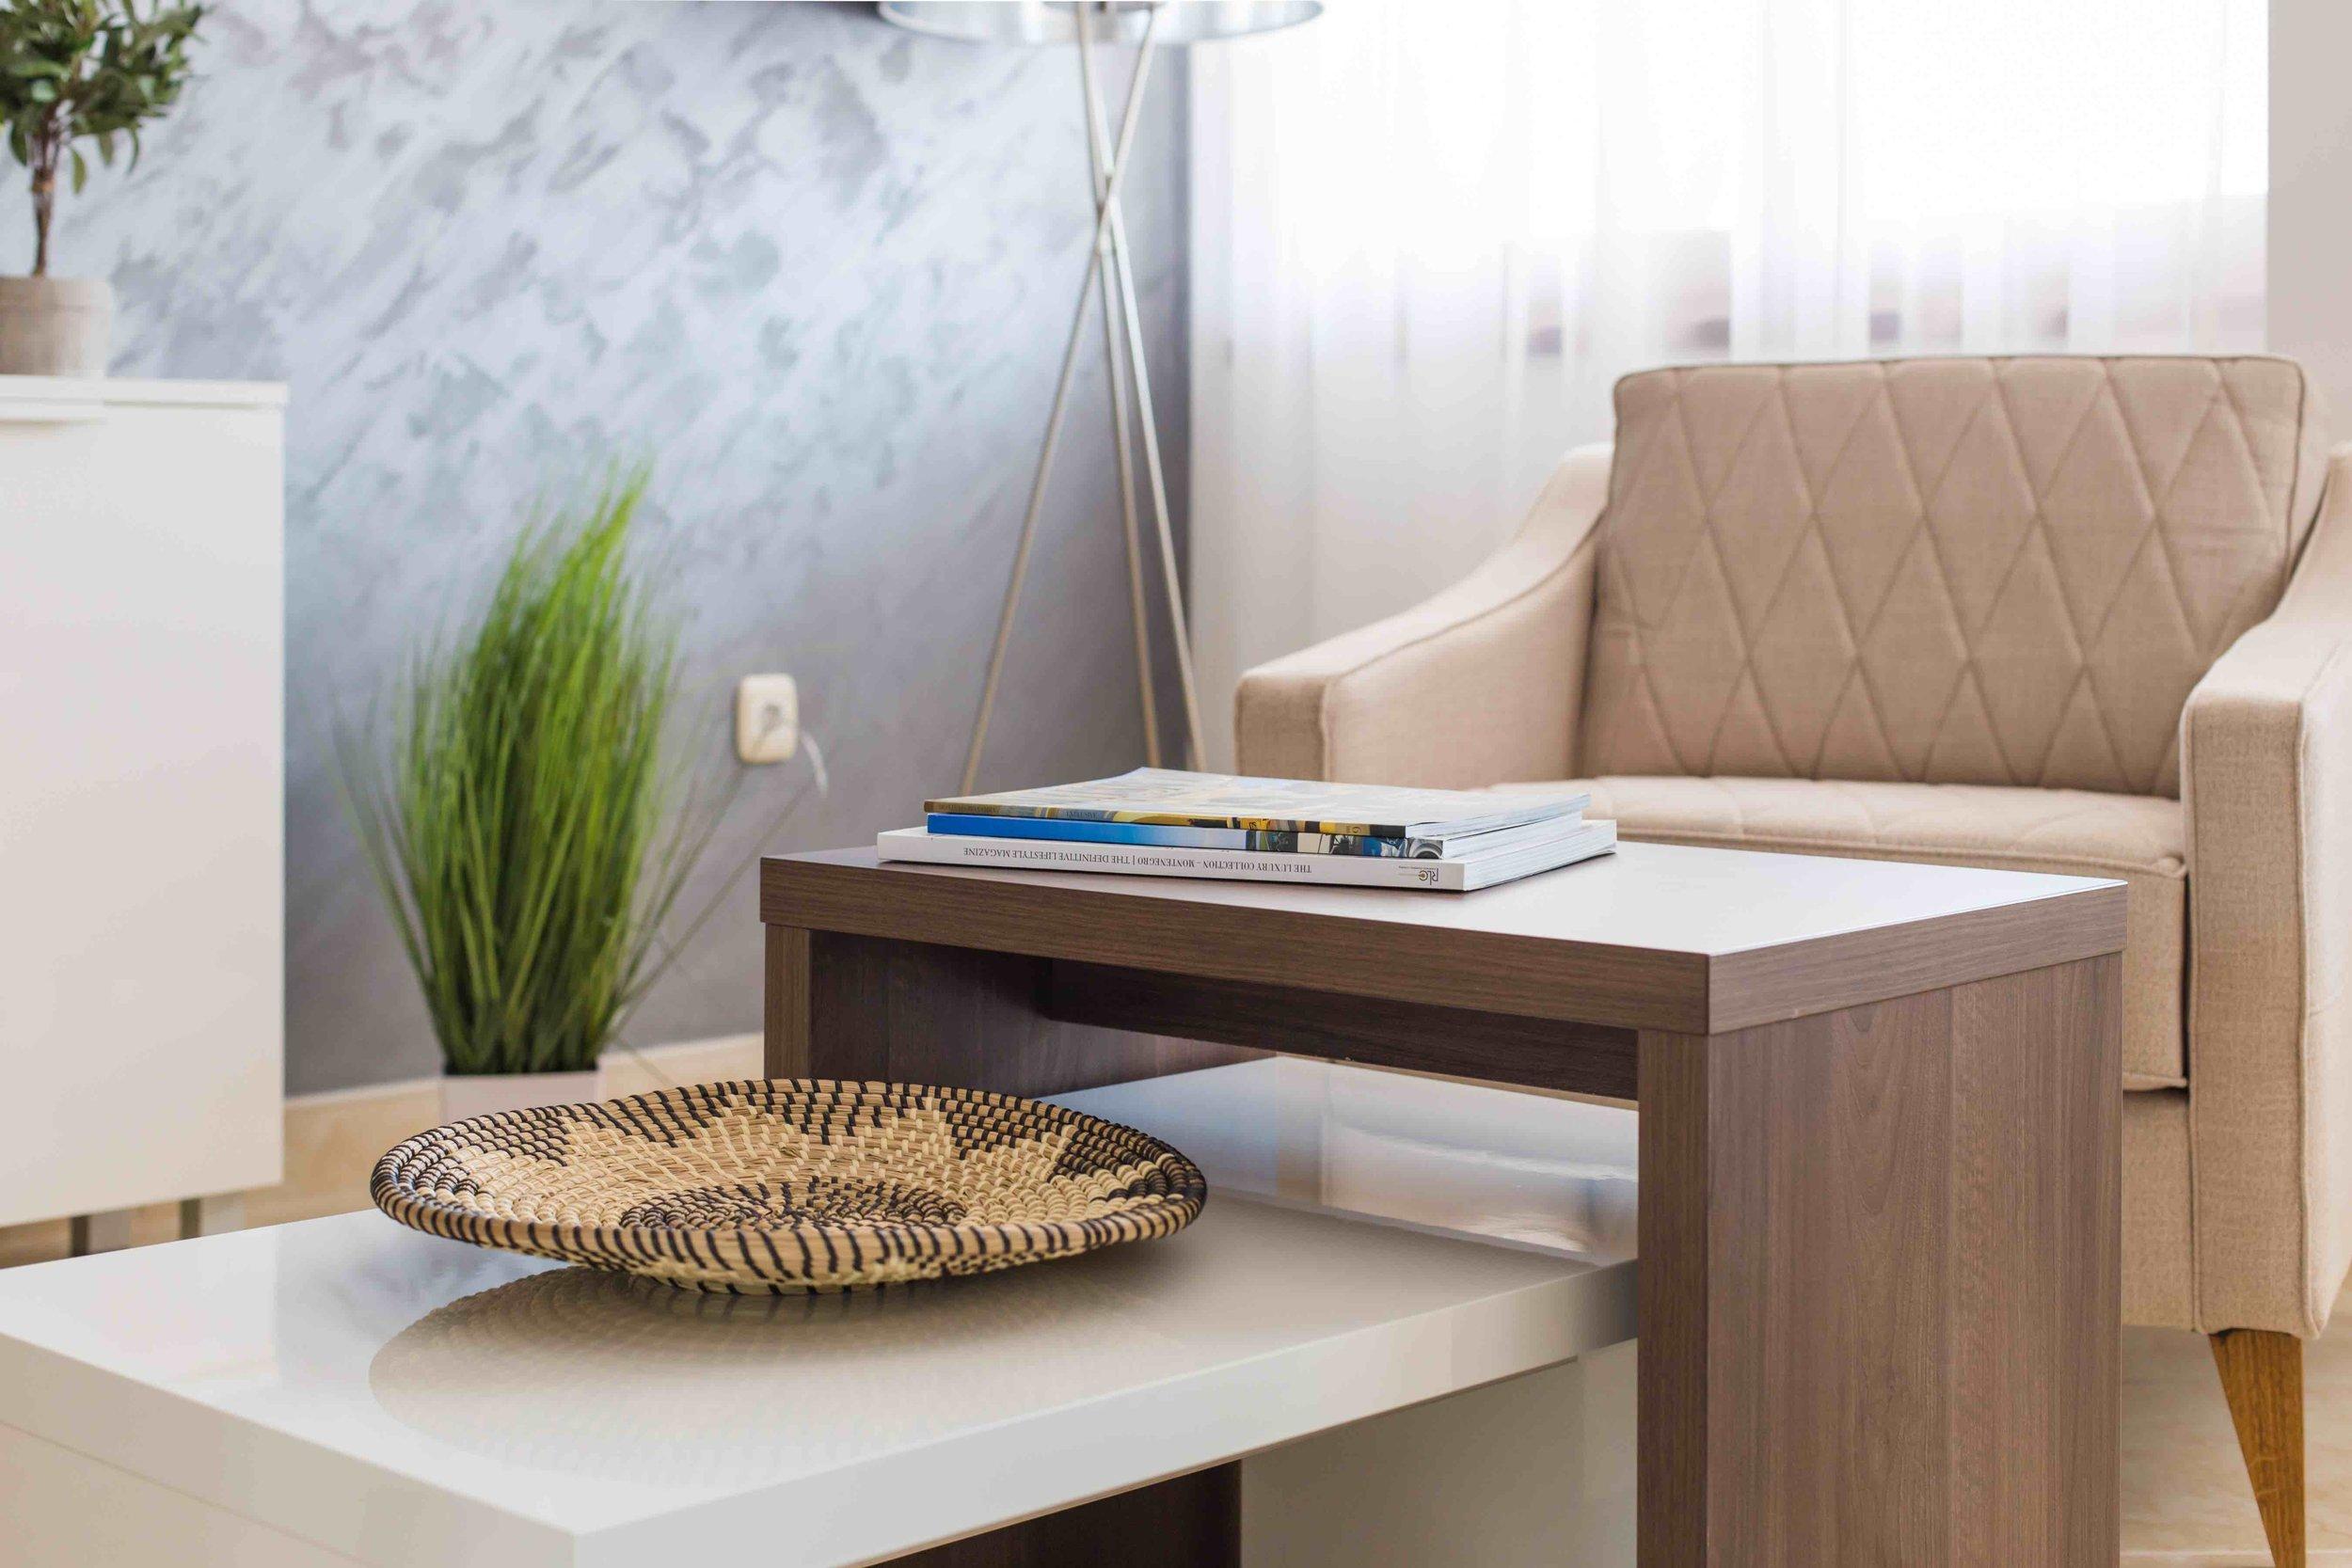 Aparthotel Апартотель | Anatolia |Becici Бечичи | Budva Будва | Montenegro Черногория | Apartments Апартаменты | Rents Аренда 15.jpg